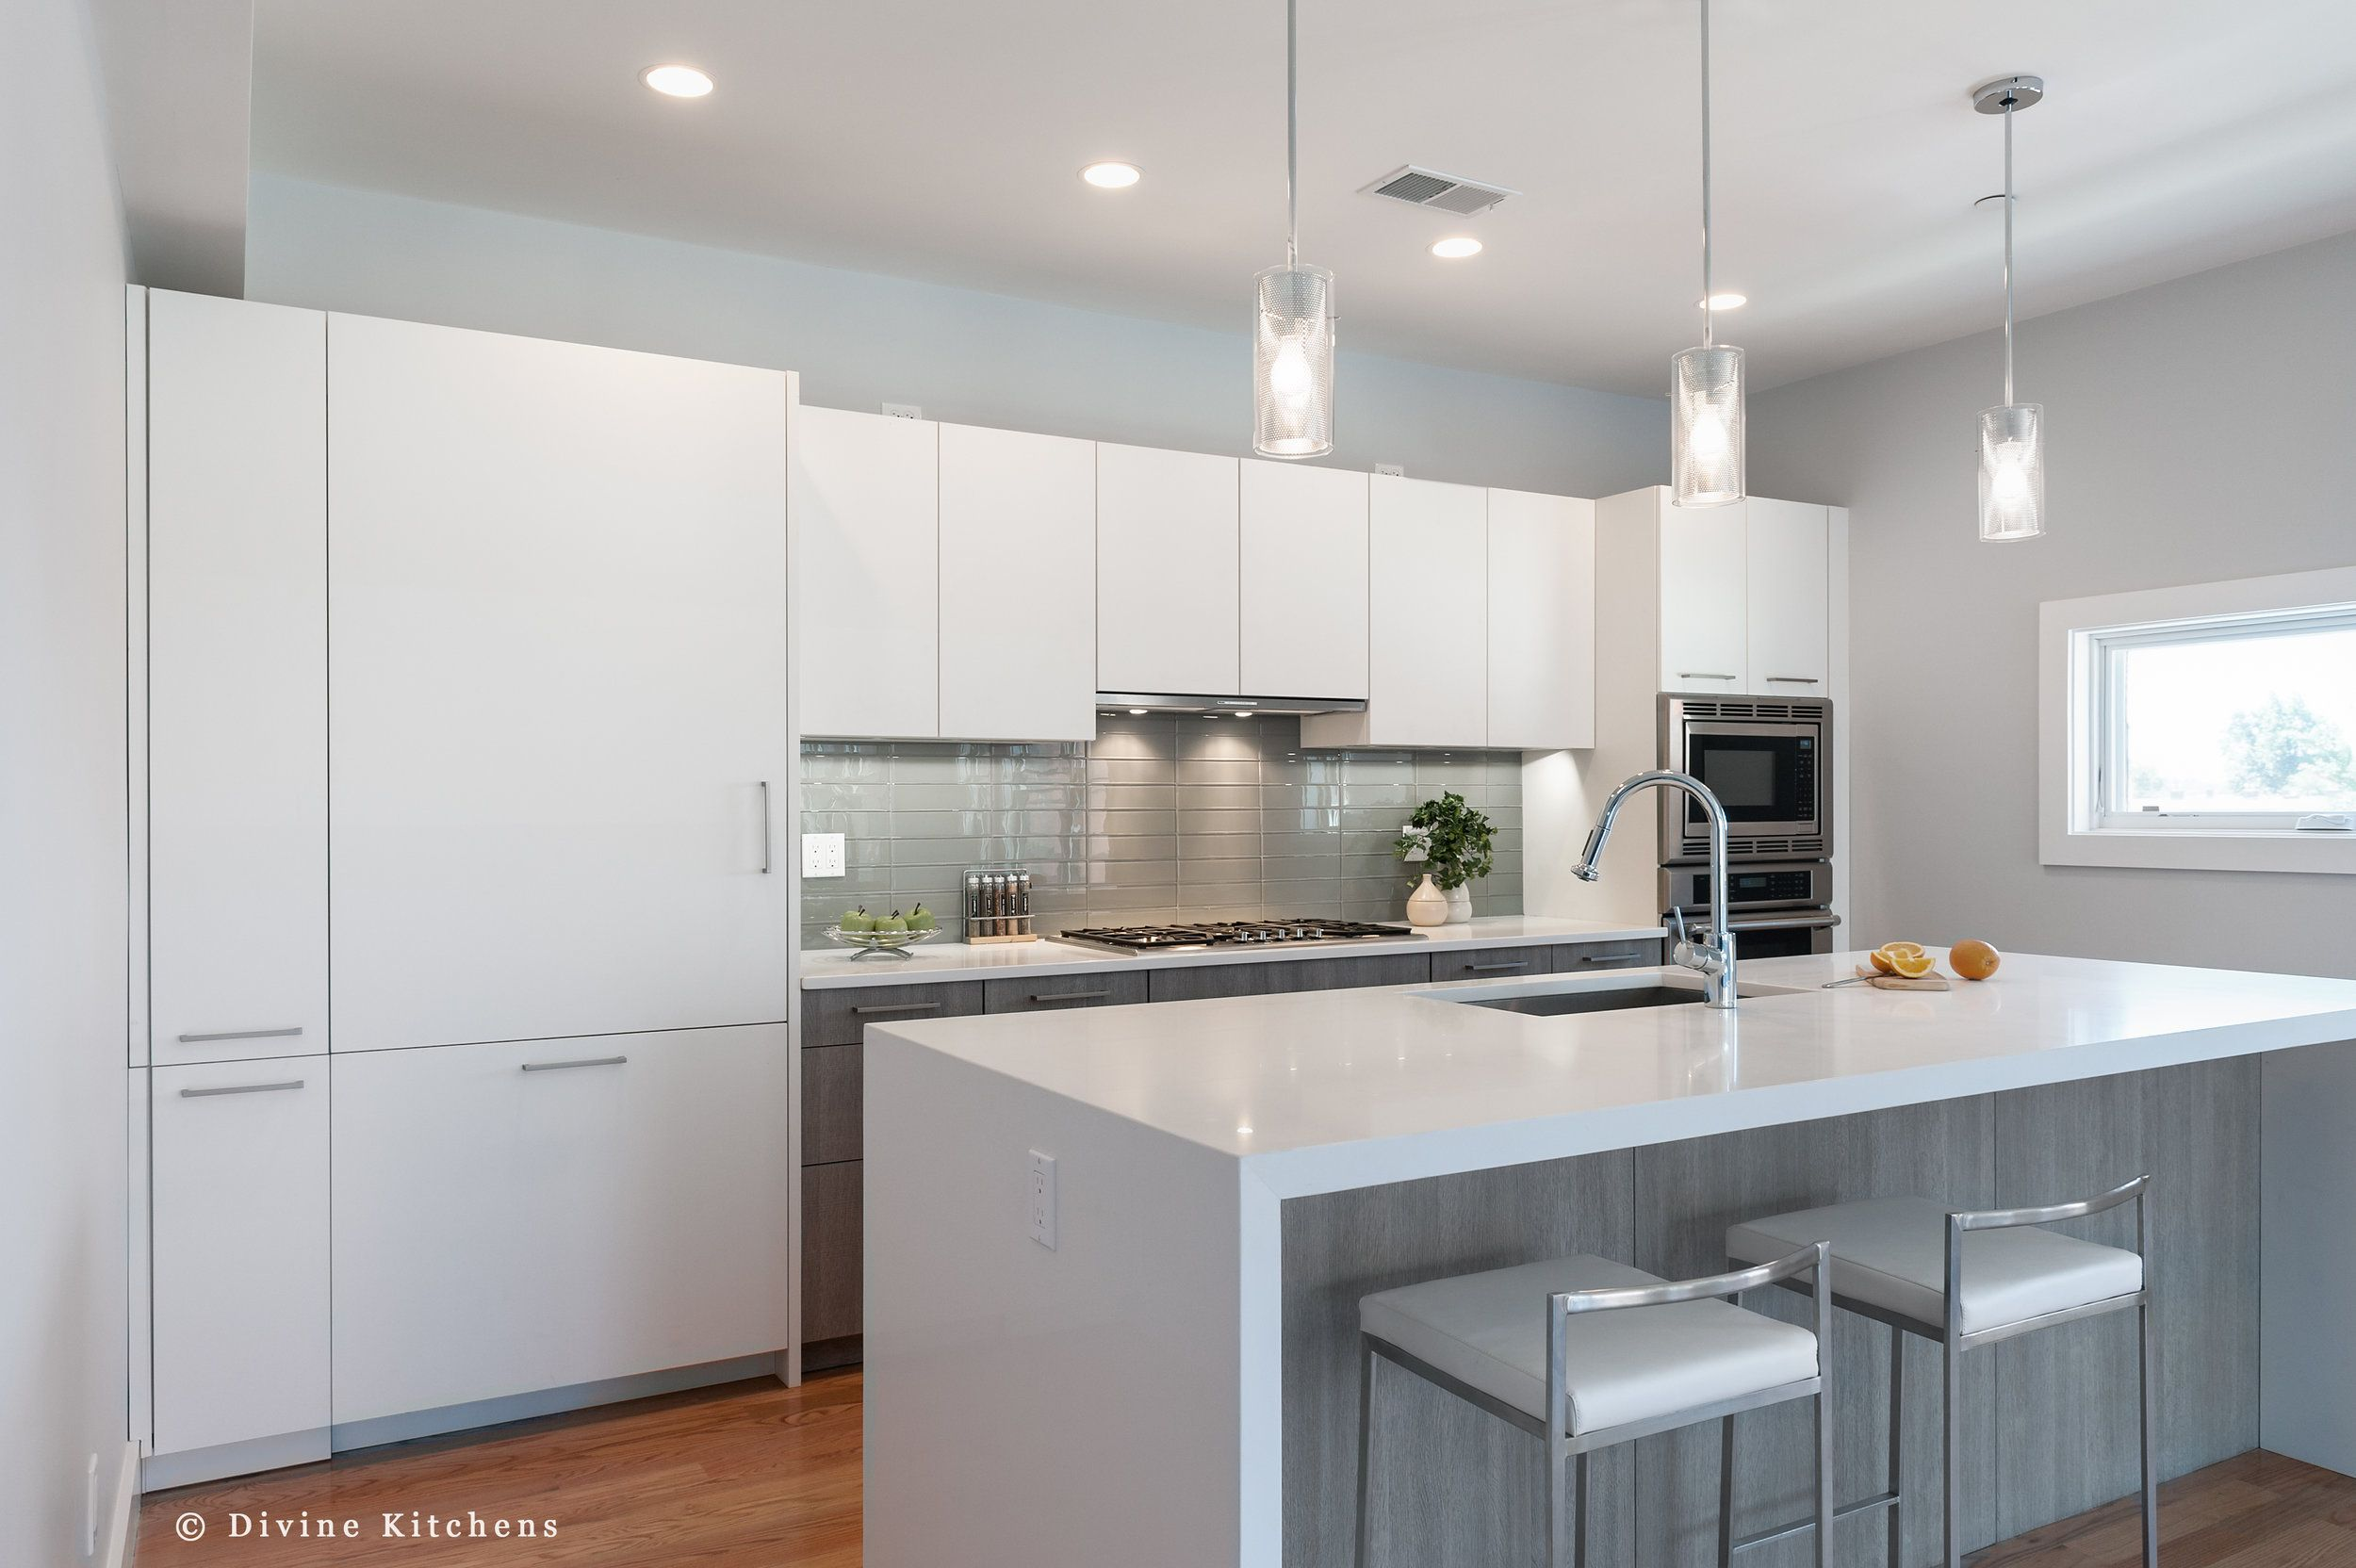 Modern kitchen with matt white, flatpanel and